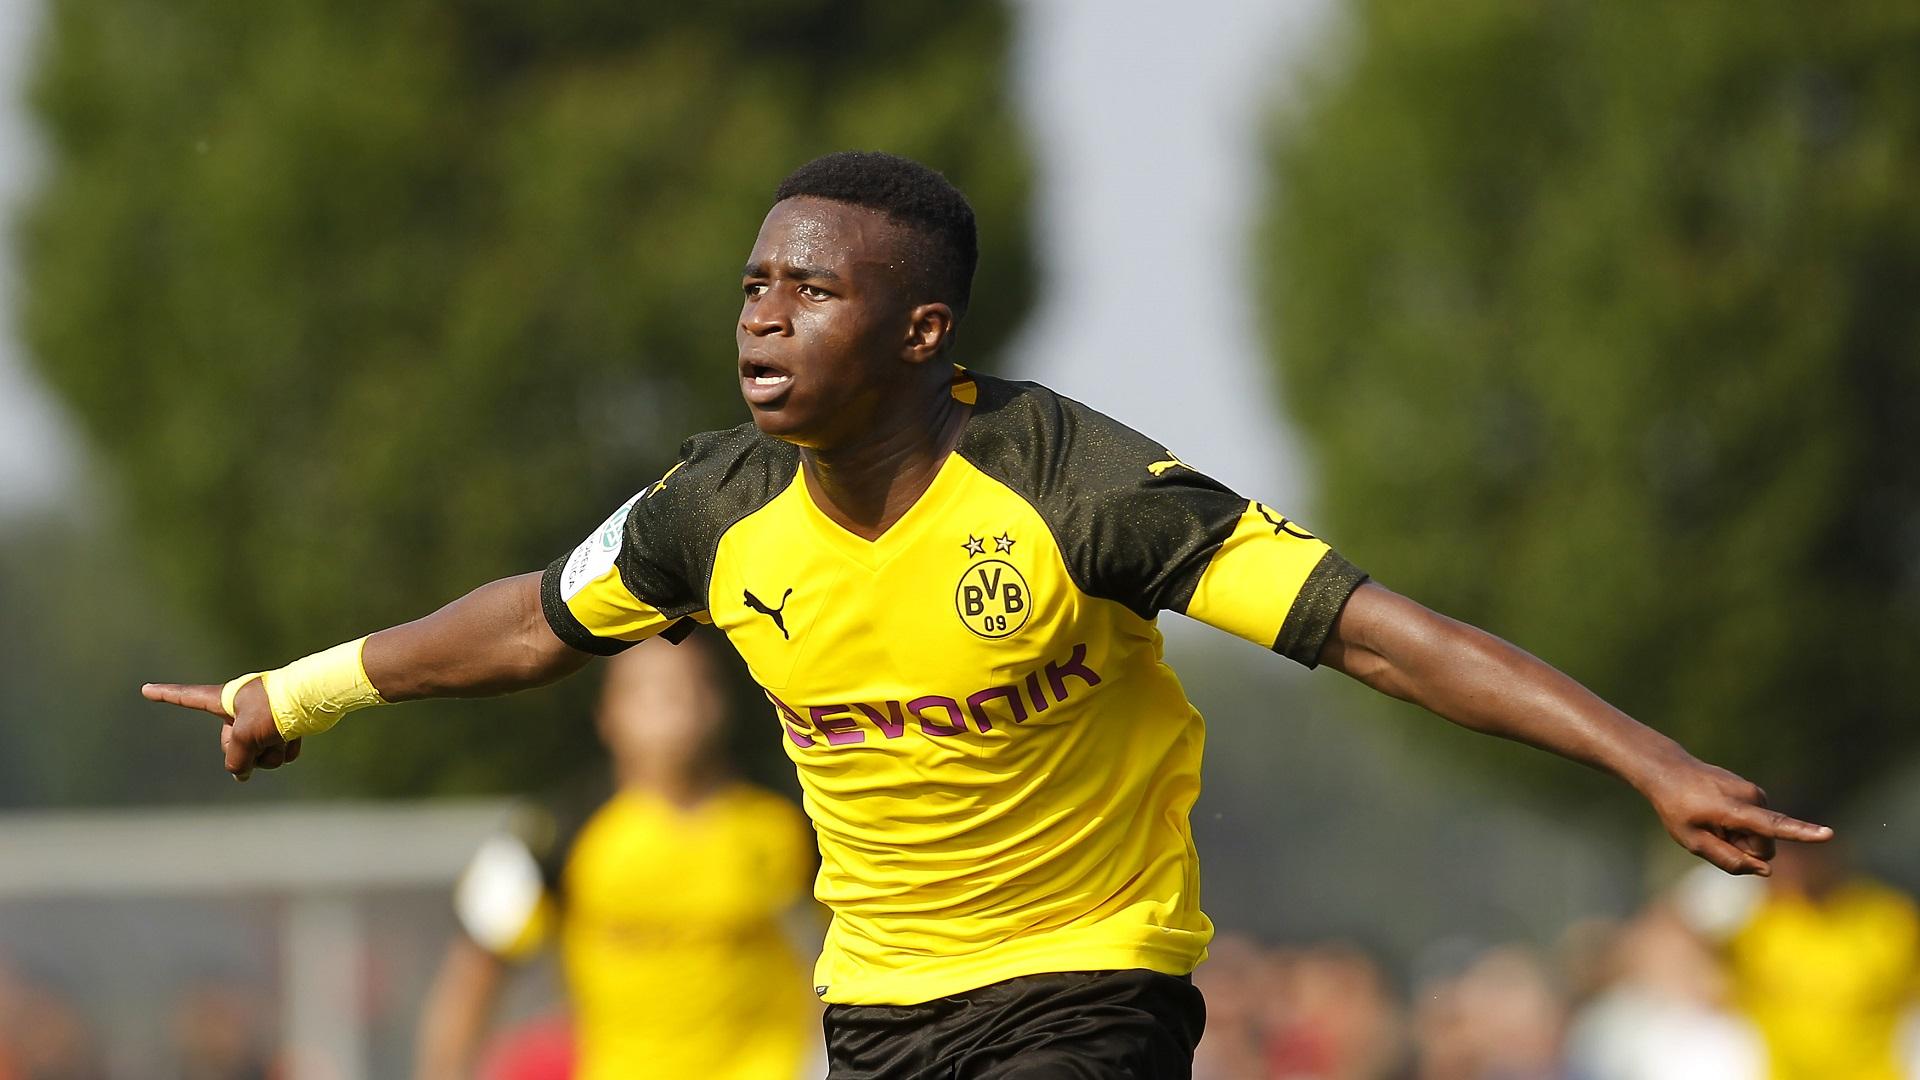 Youssufa Moukoko Borussia Dortmund 15 year old striker